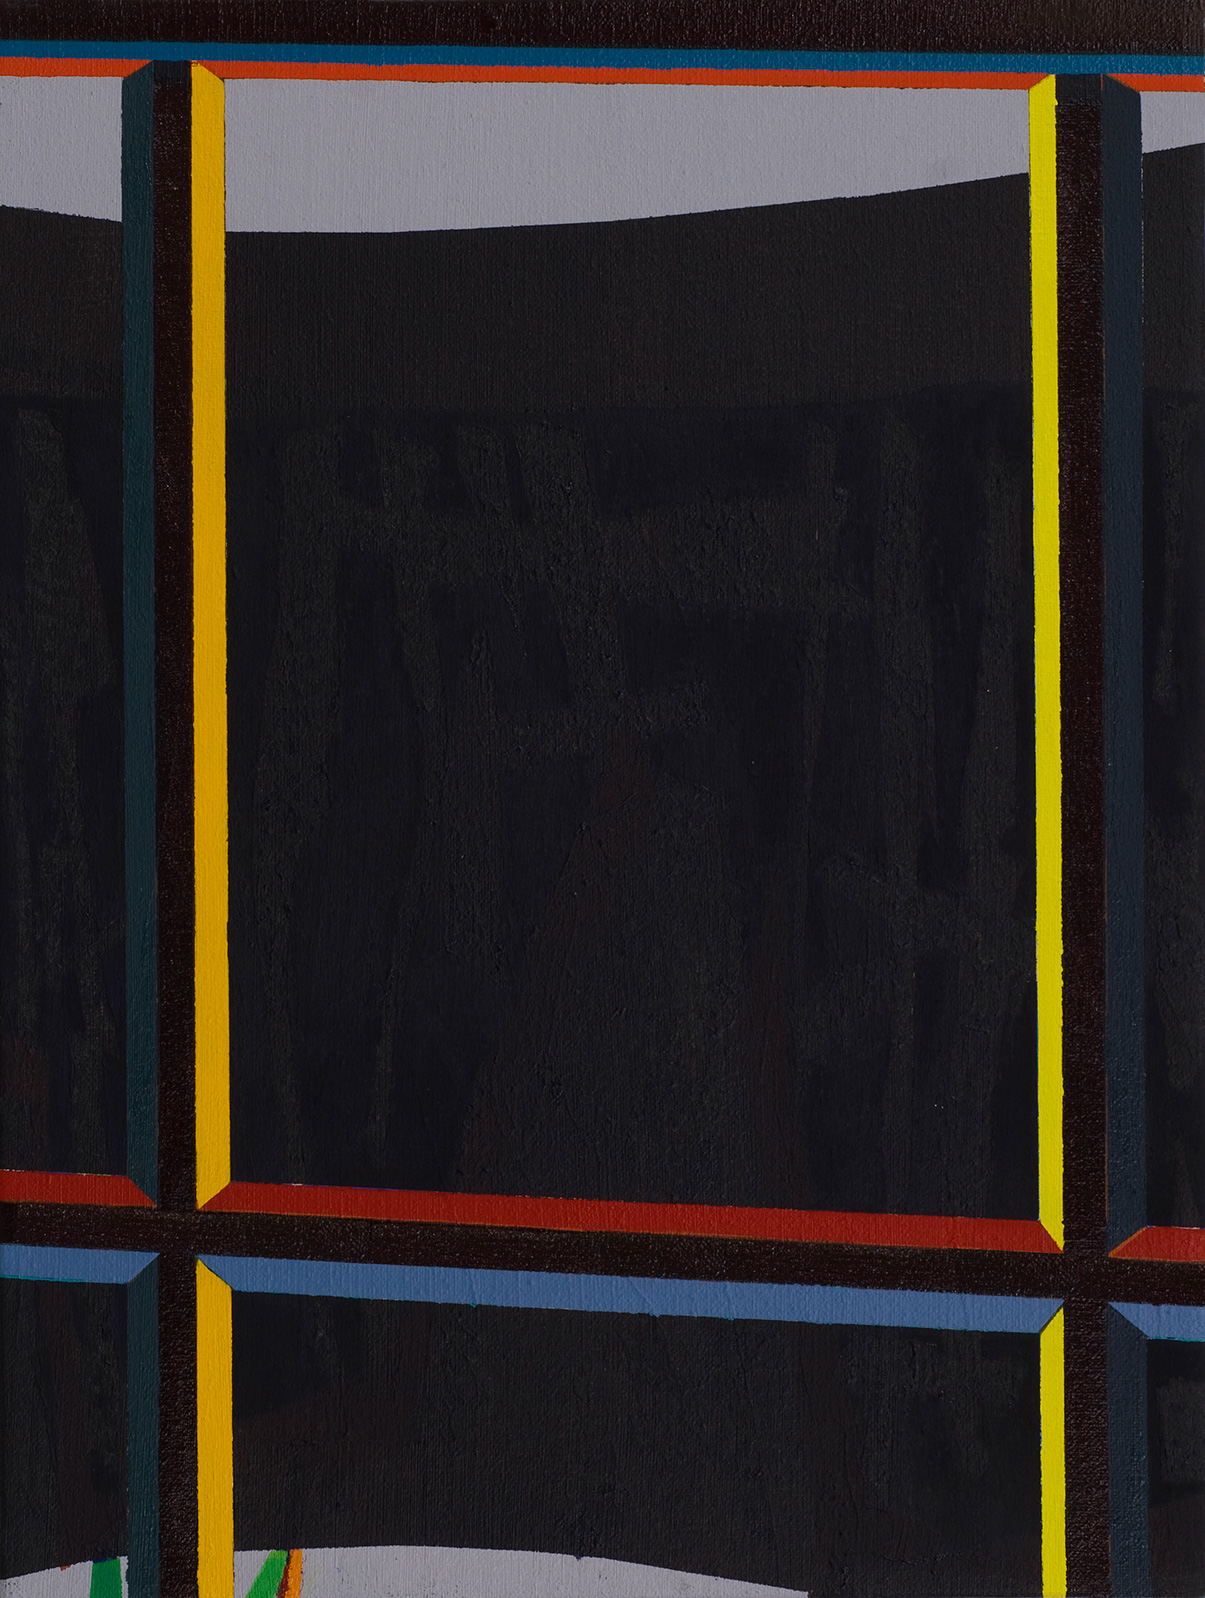 Small window   2012